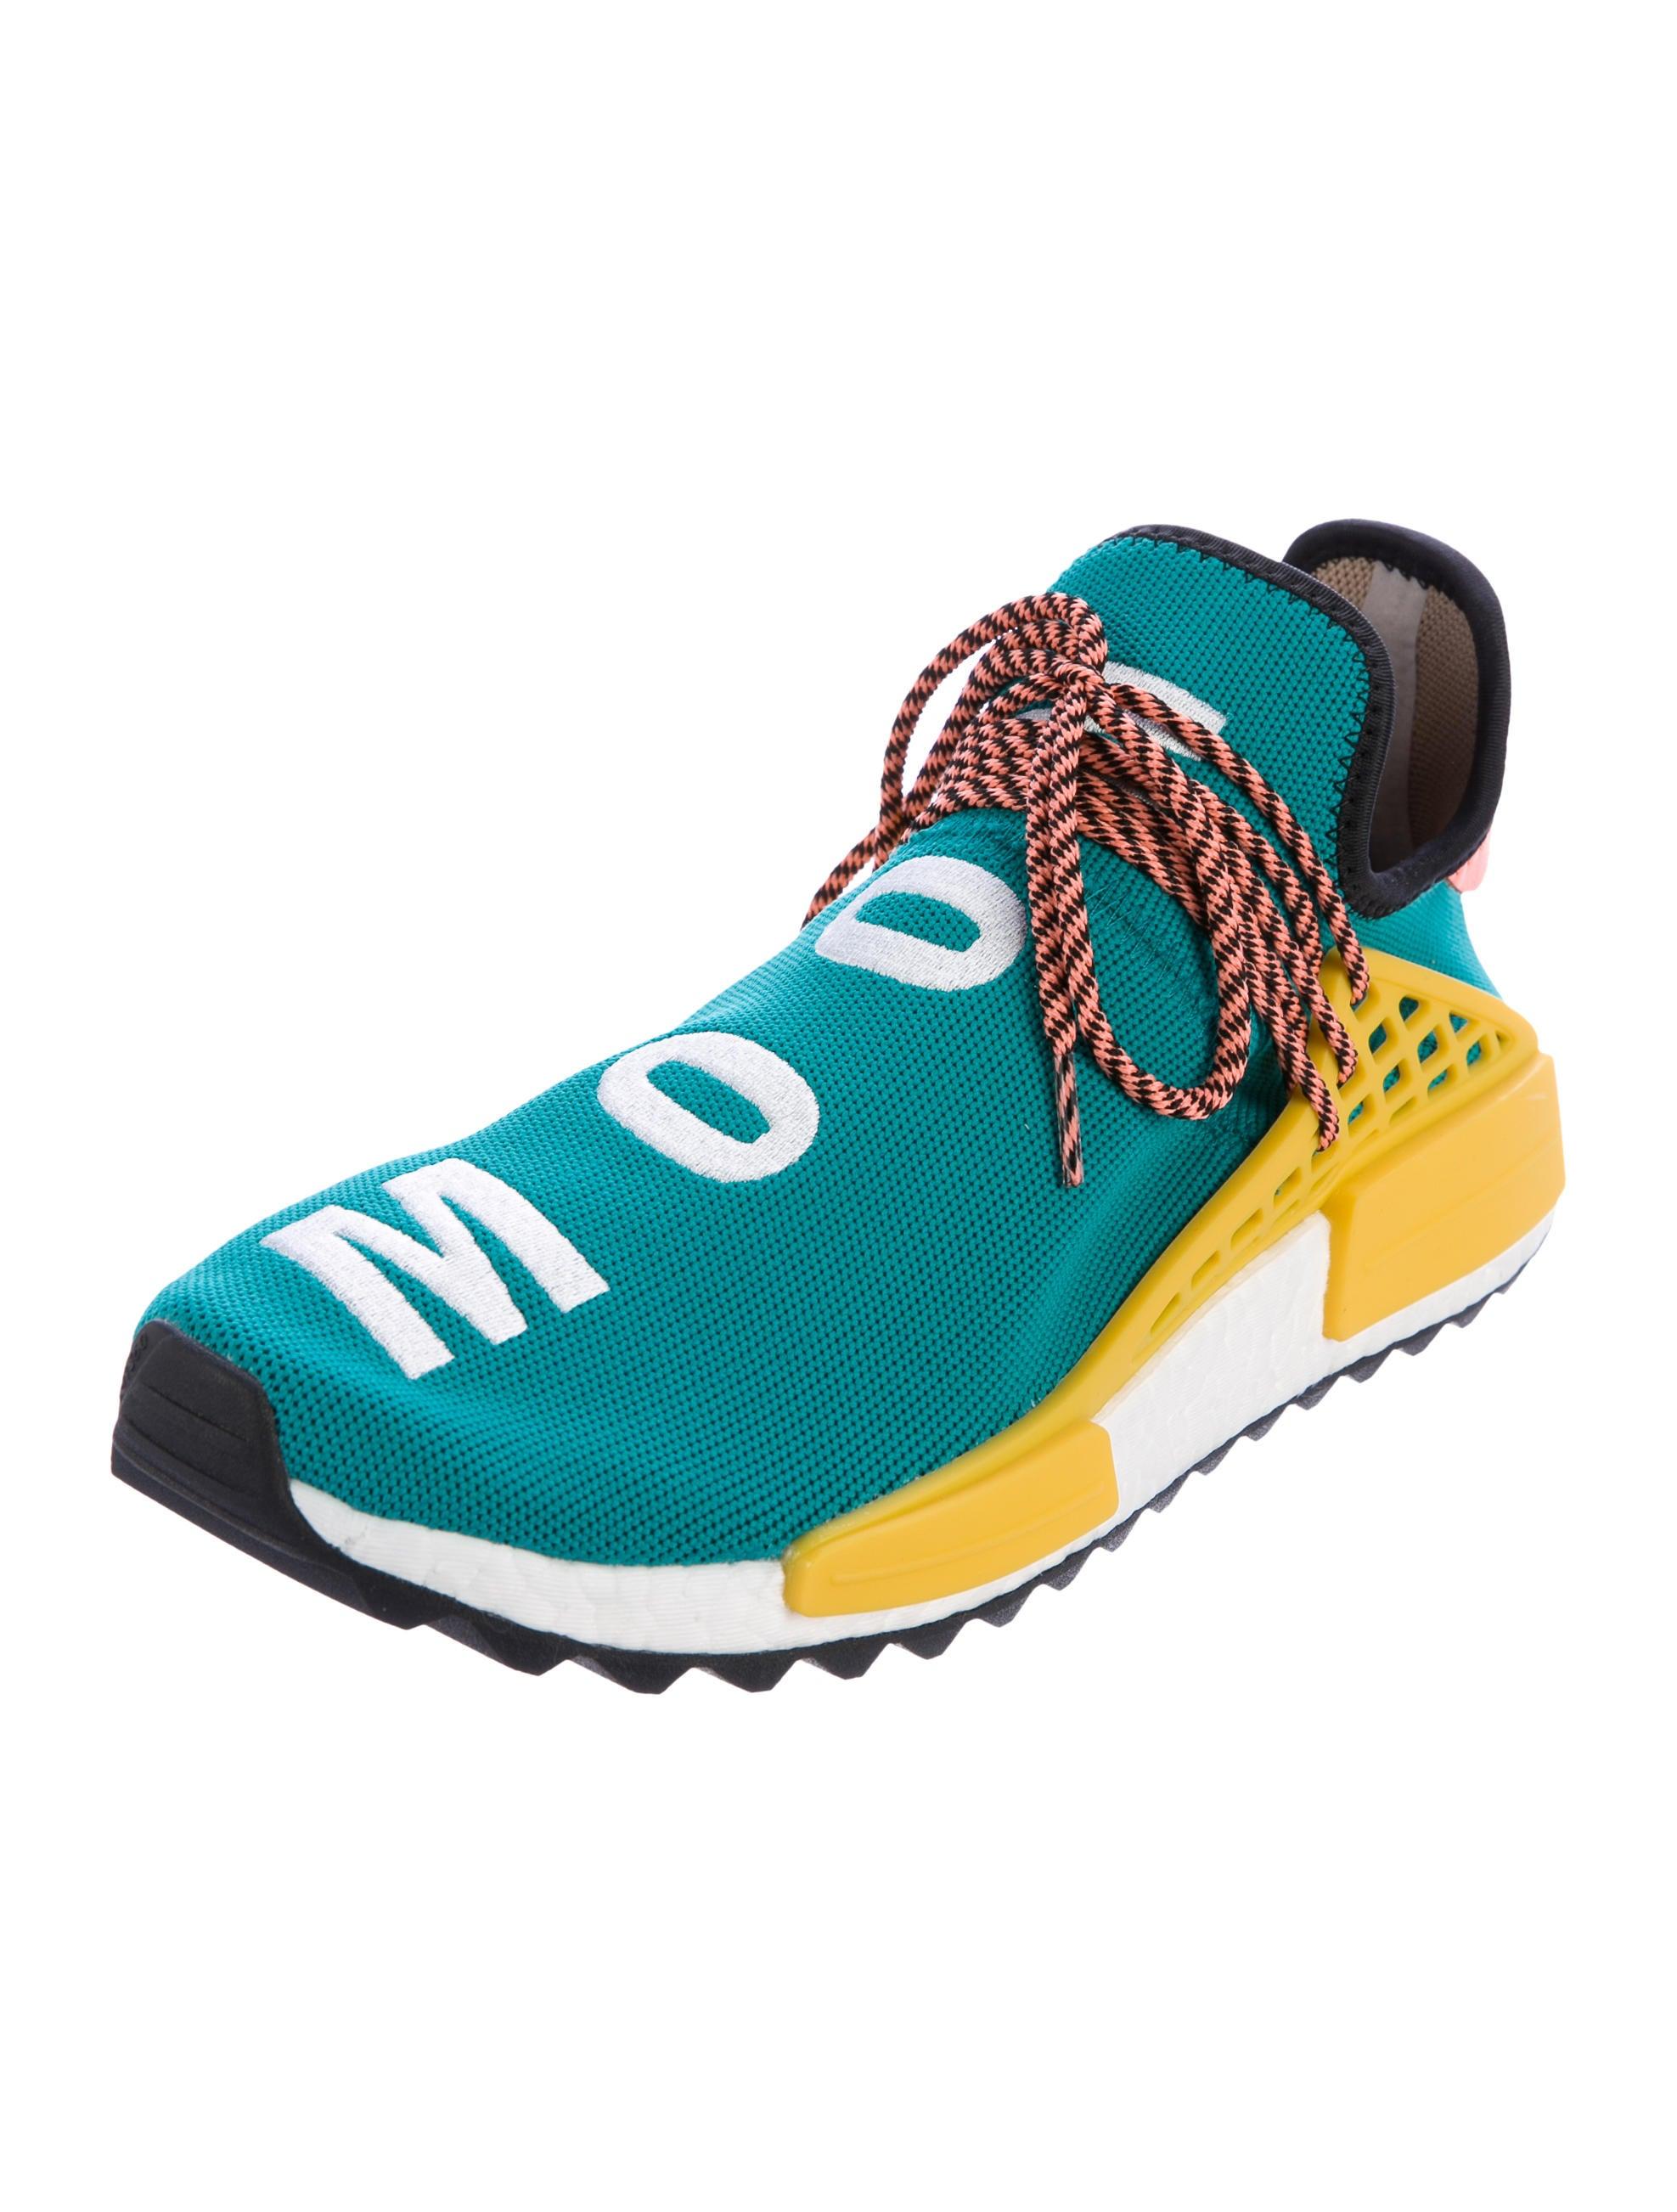 13e61b7ec Pharrell Williams X Adidas Human Race Nmd Tr Pharrell